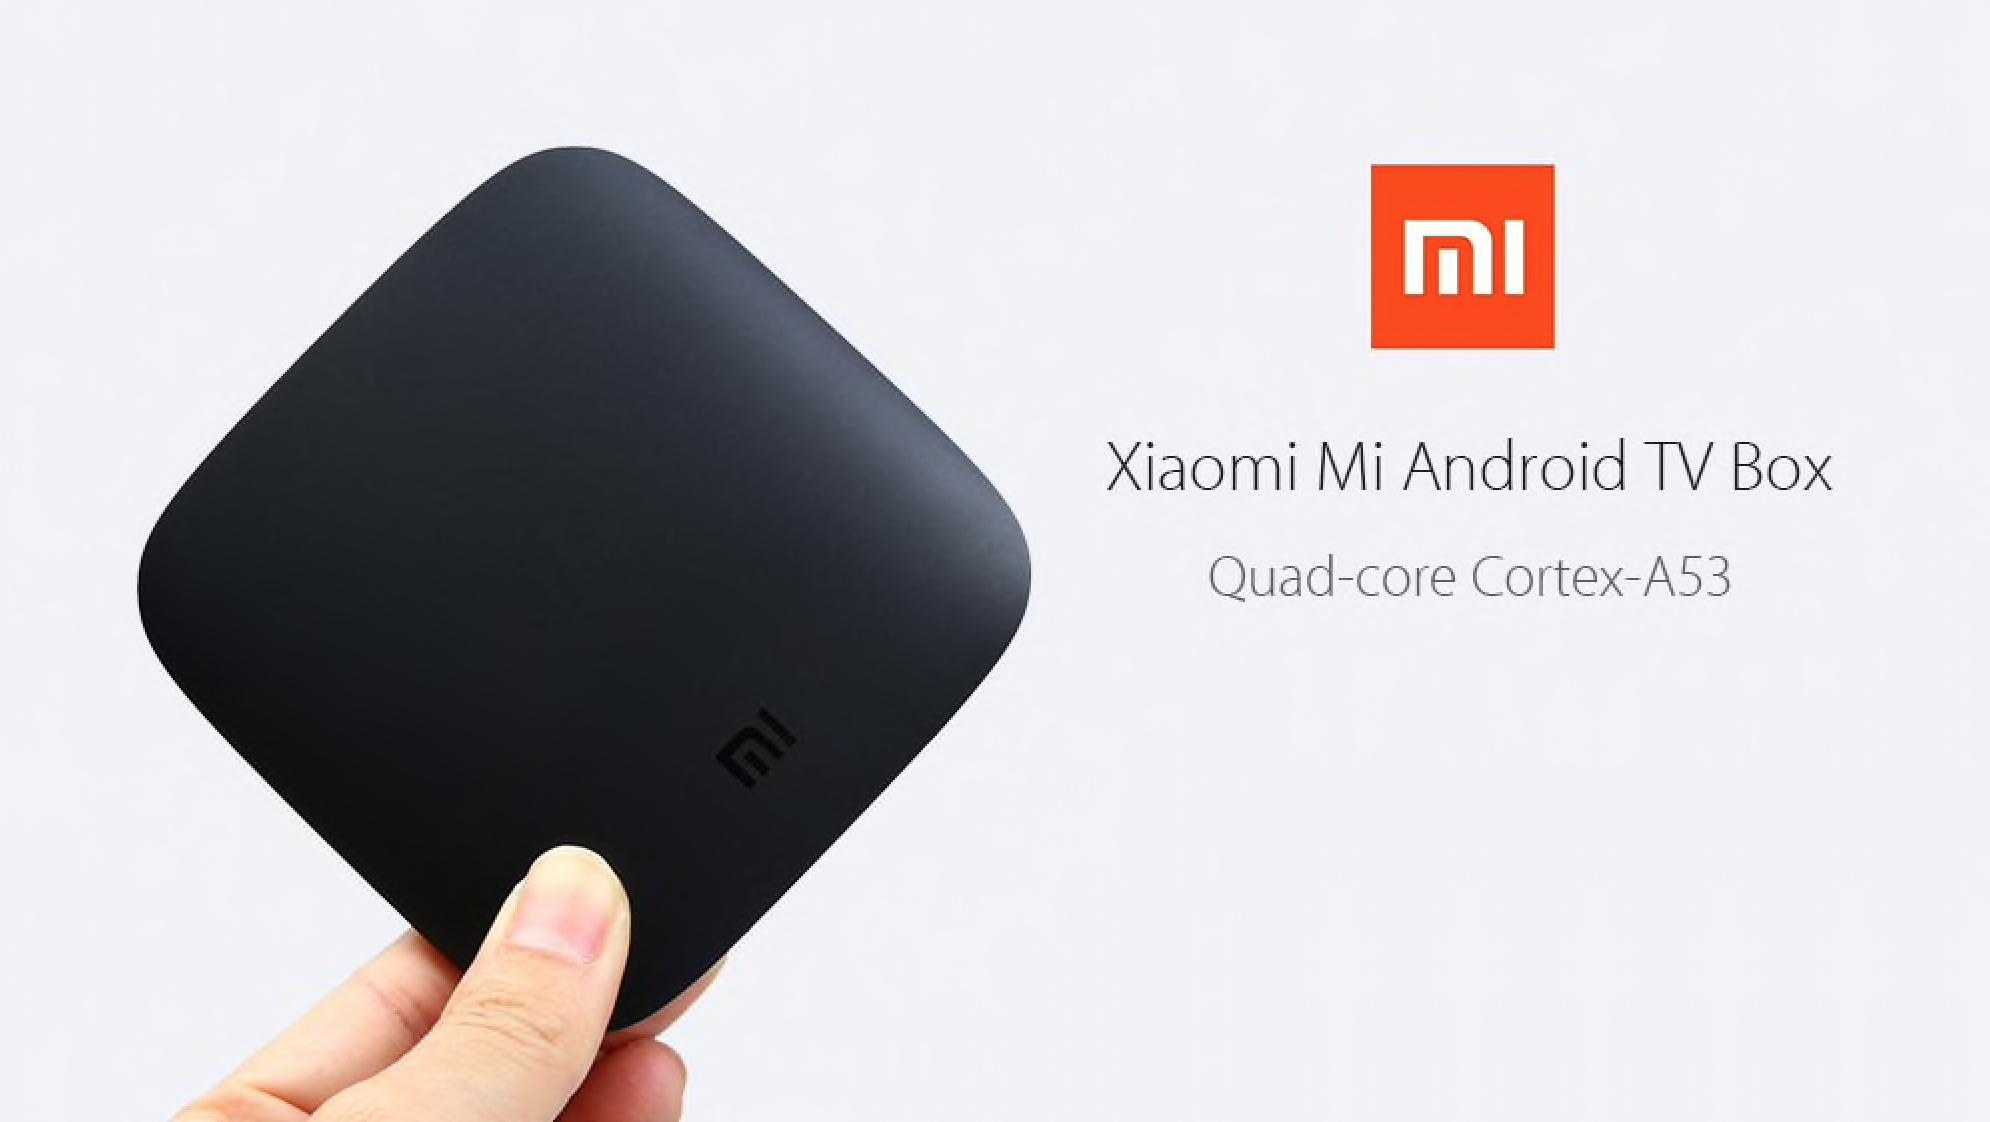 Xiaomi Mi Tv Box nyní za exkluzivní cenu na e-shopu eBay.com [Sponzorovaný článek]